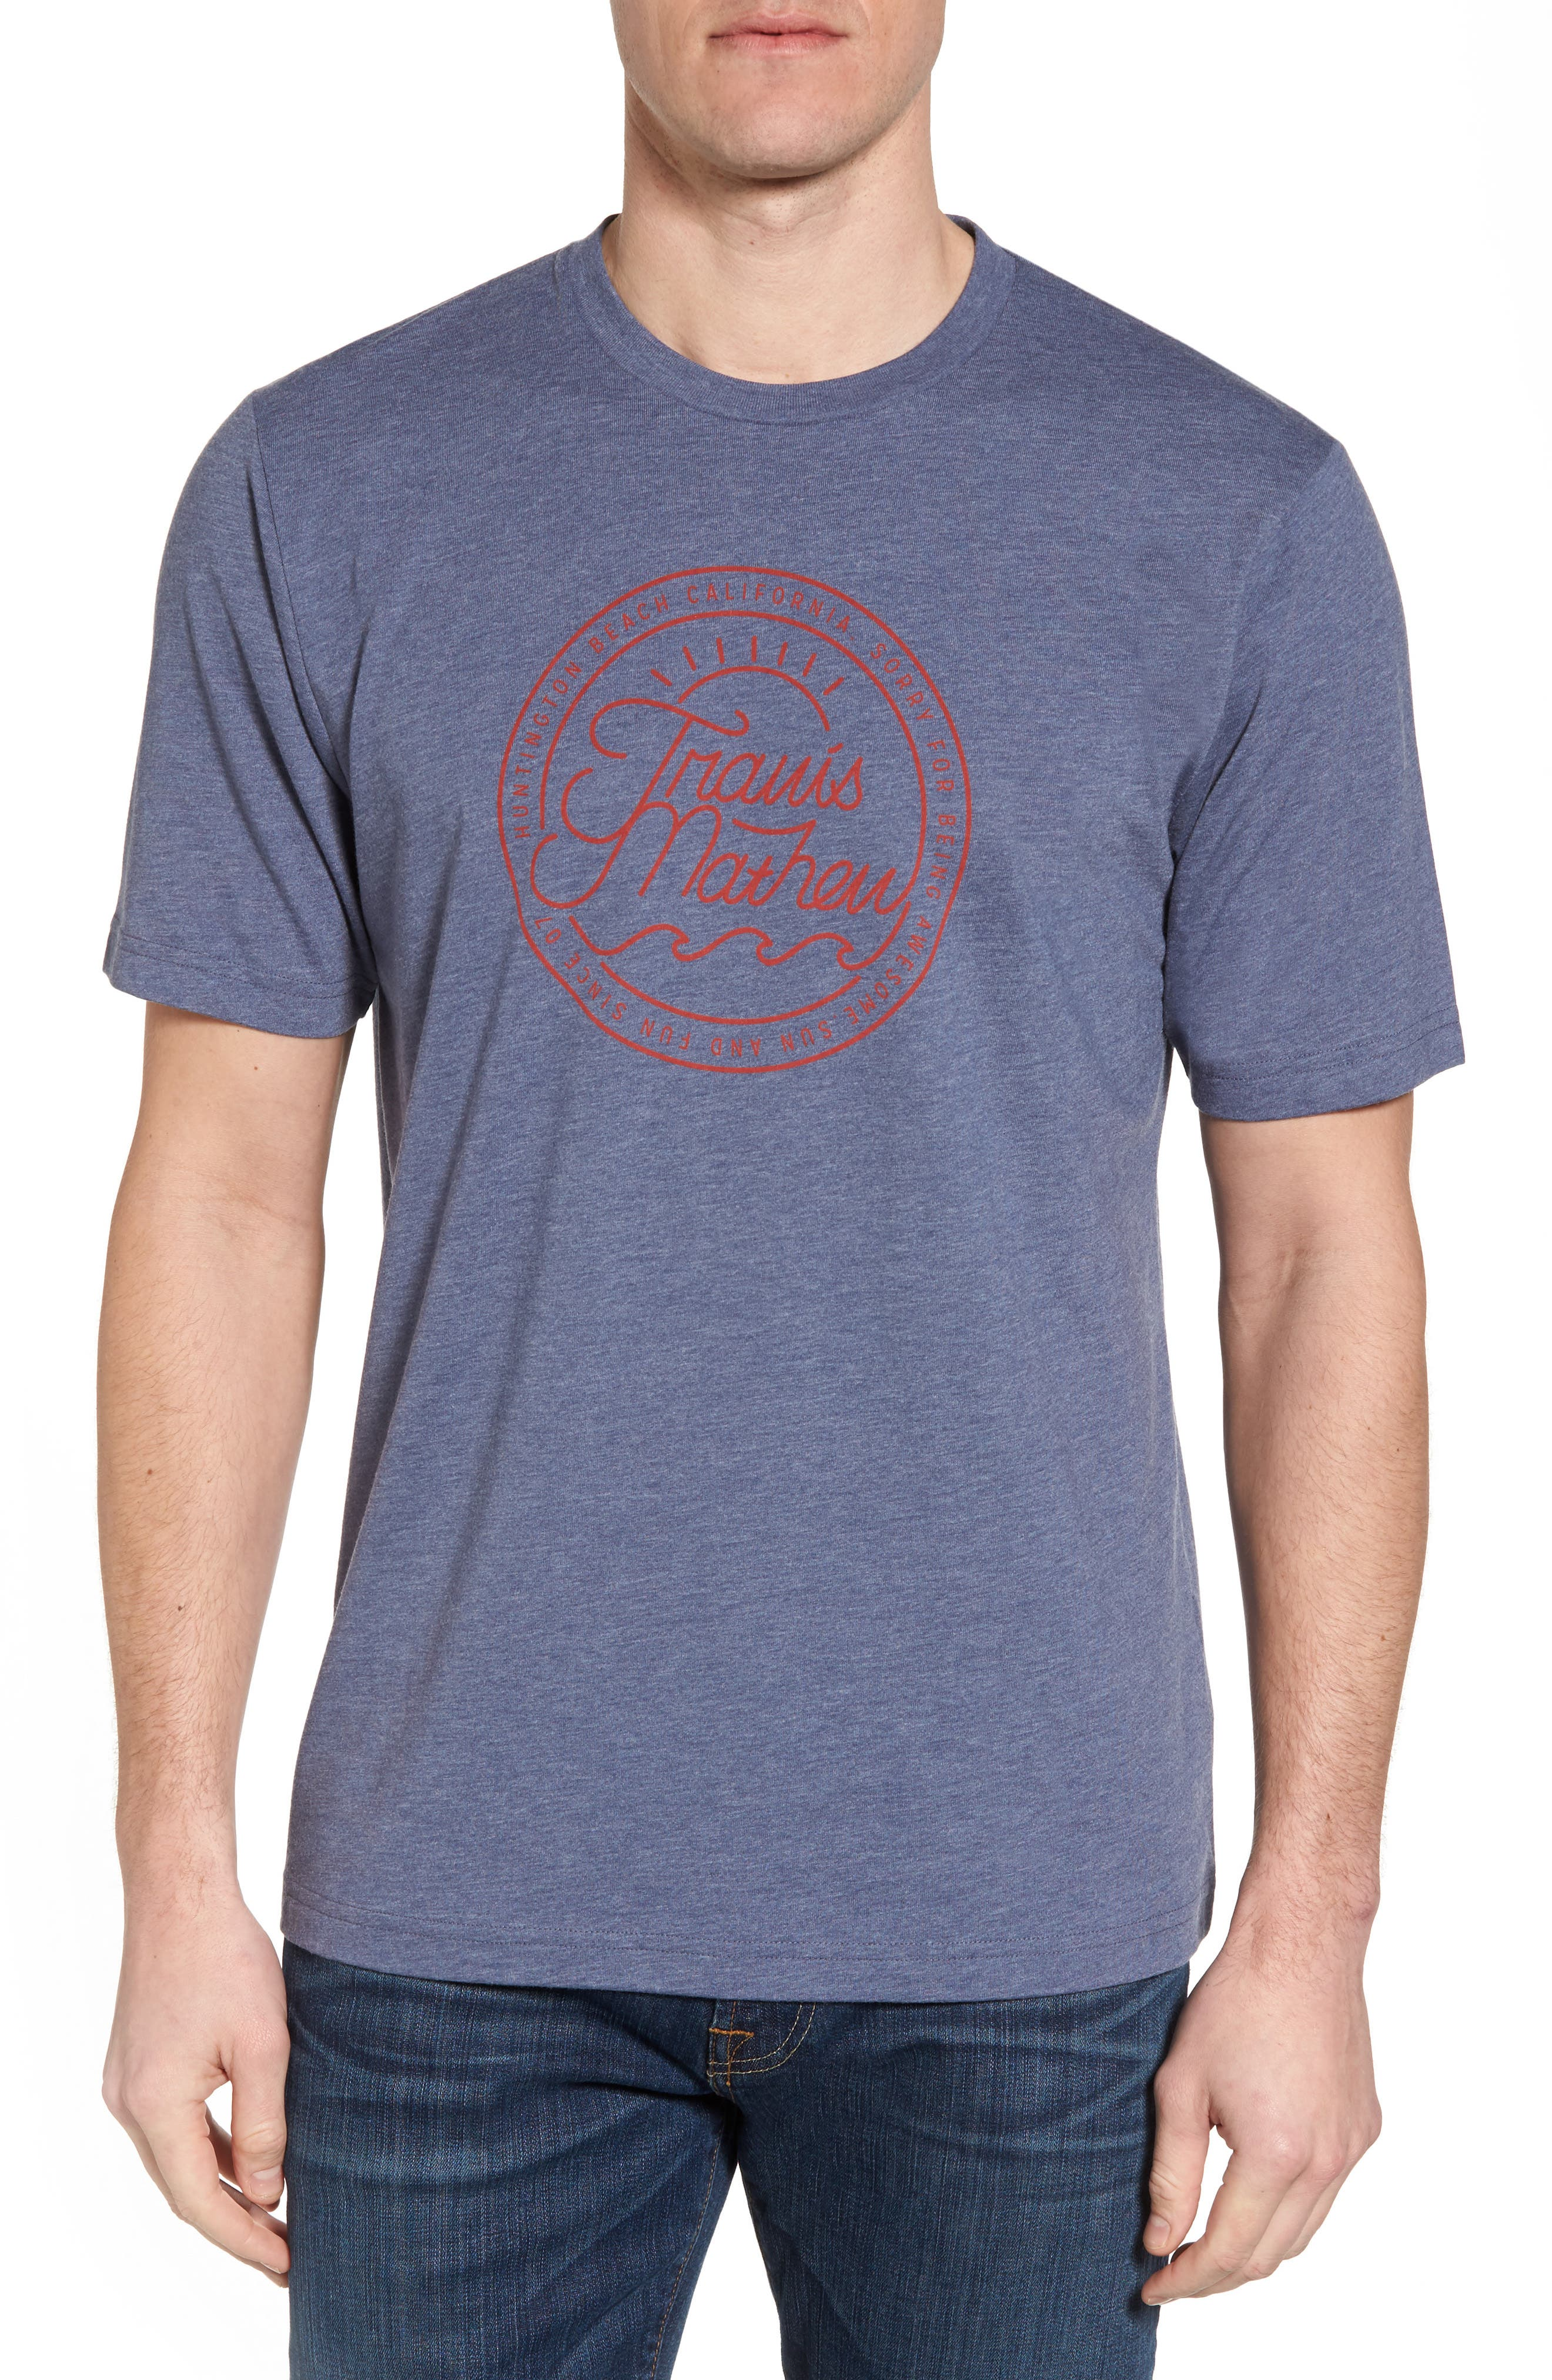 Drebo Graphic T-Shirt,                         Main,                         color, Heather Blue Nights